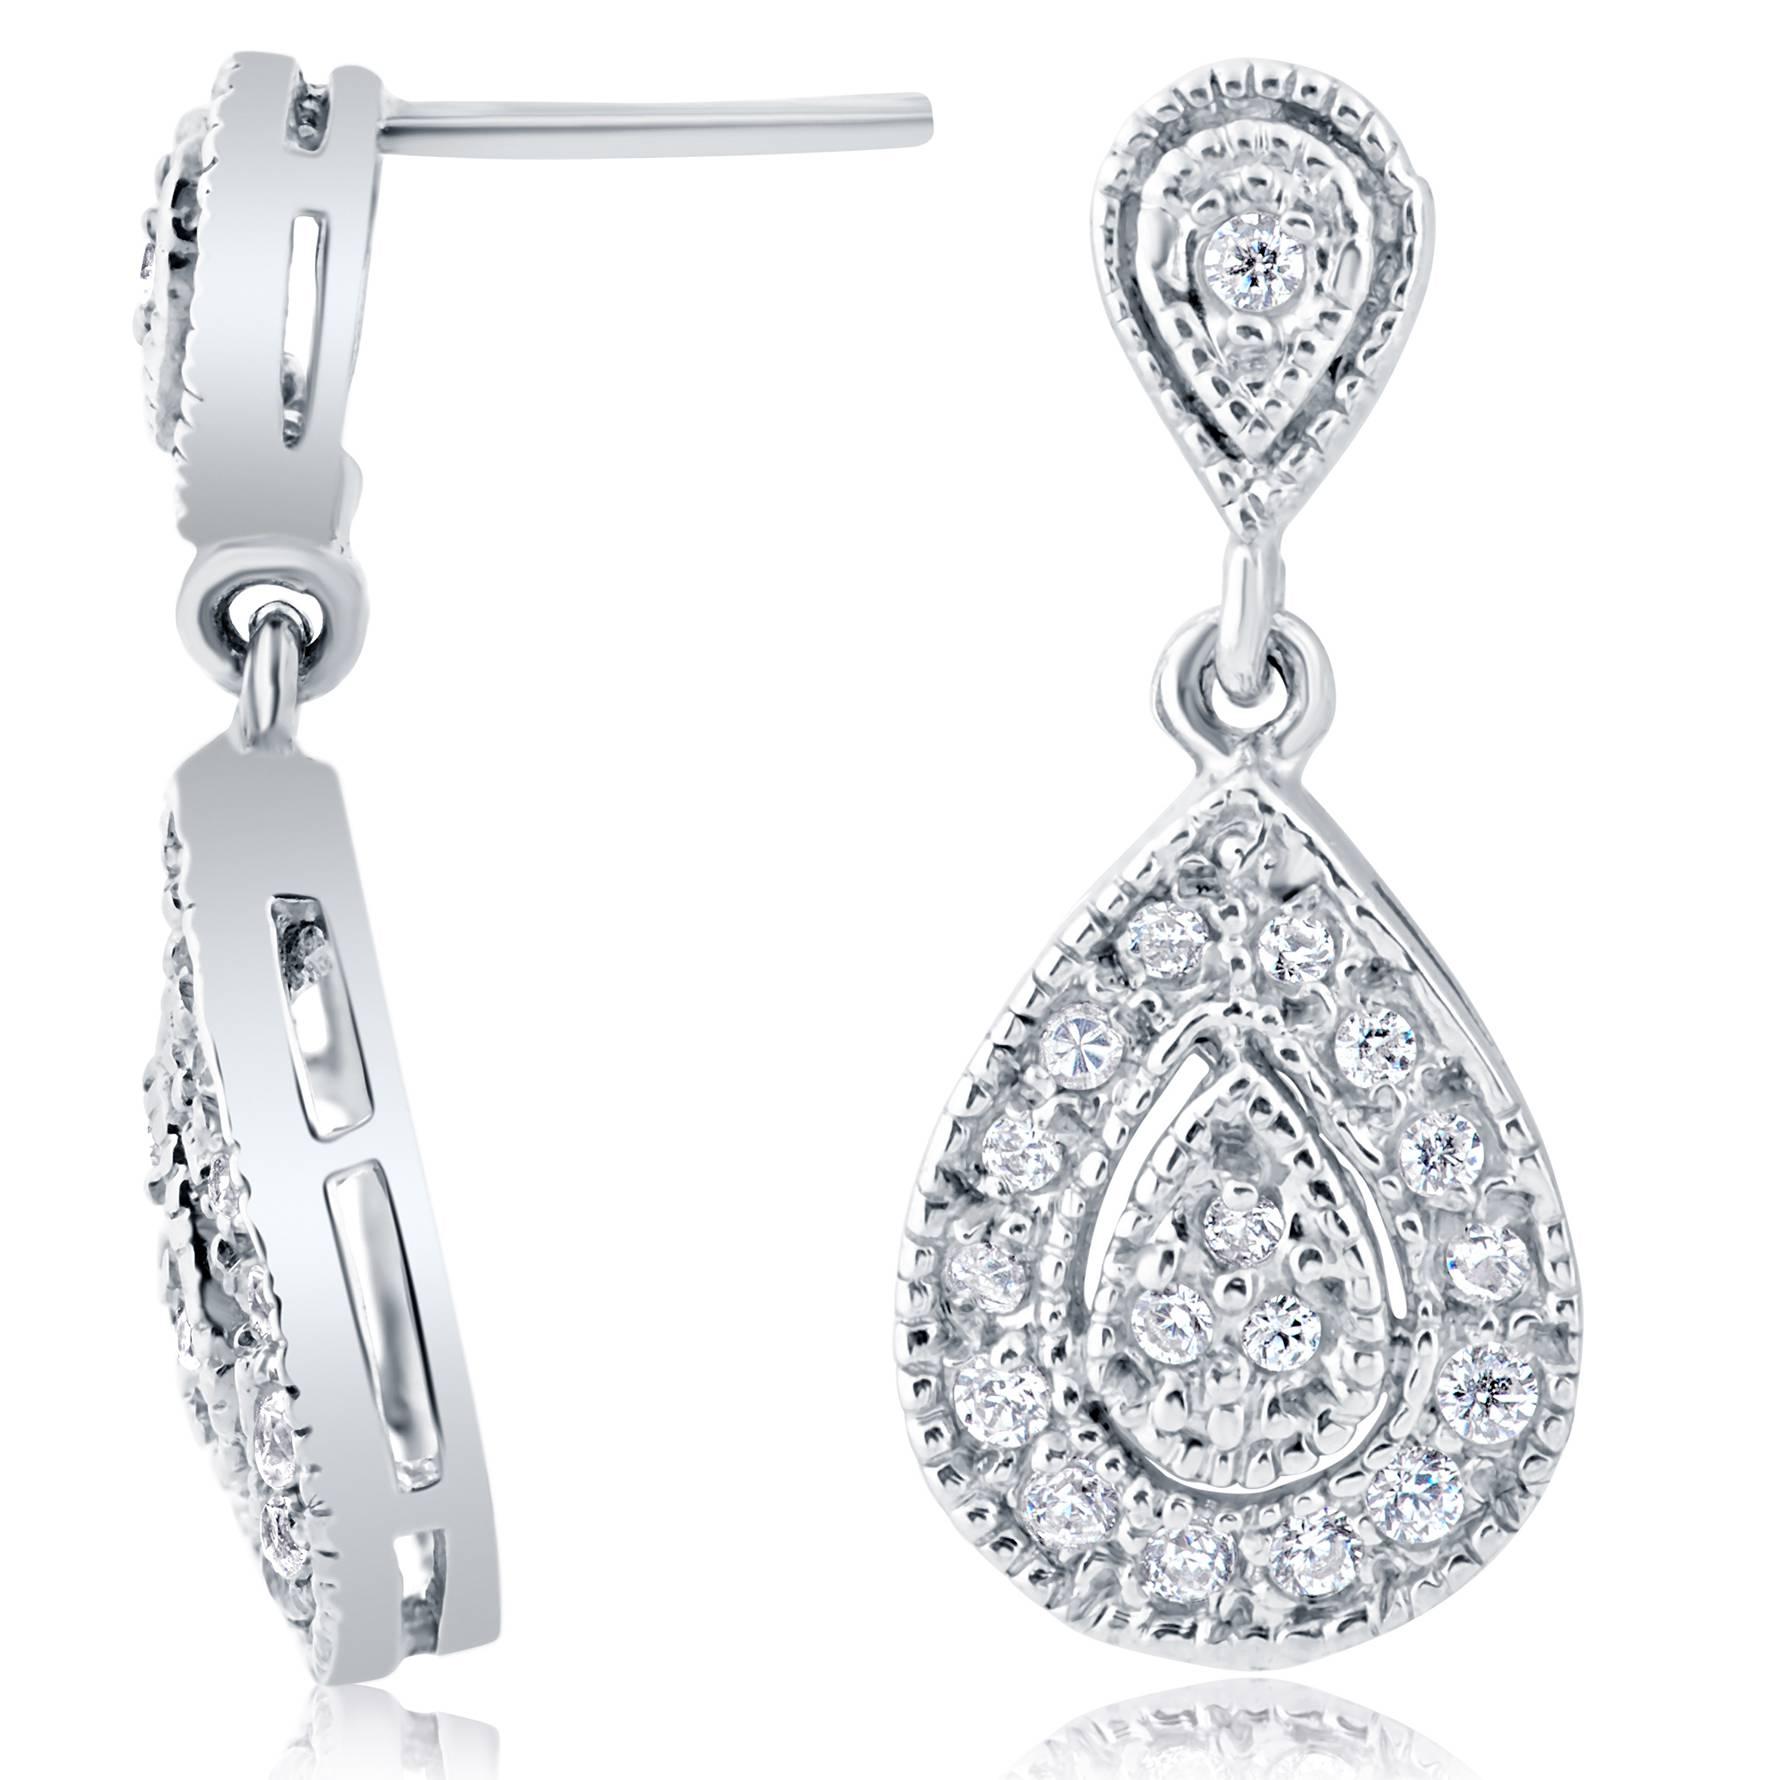 12 ct pear shape dangle diamond earrings 10 karat white